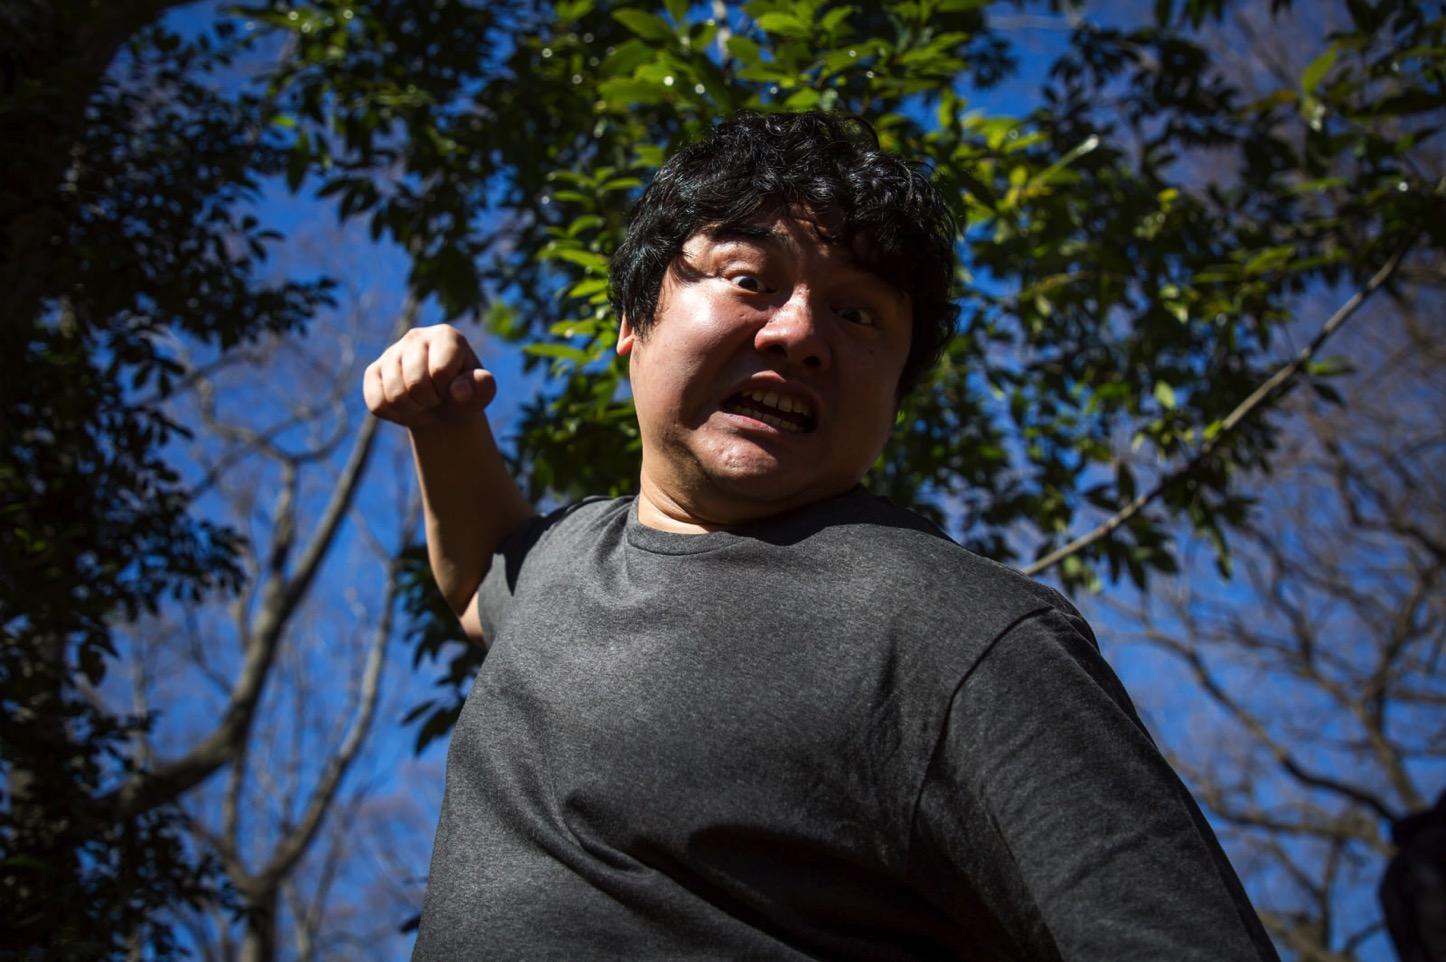 Punching Danda Pakutaso